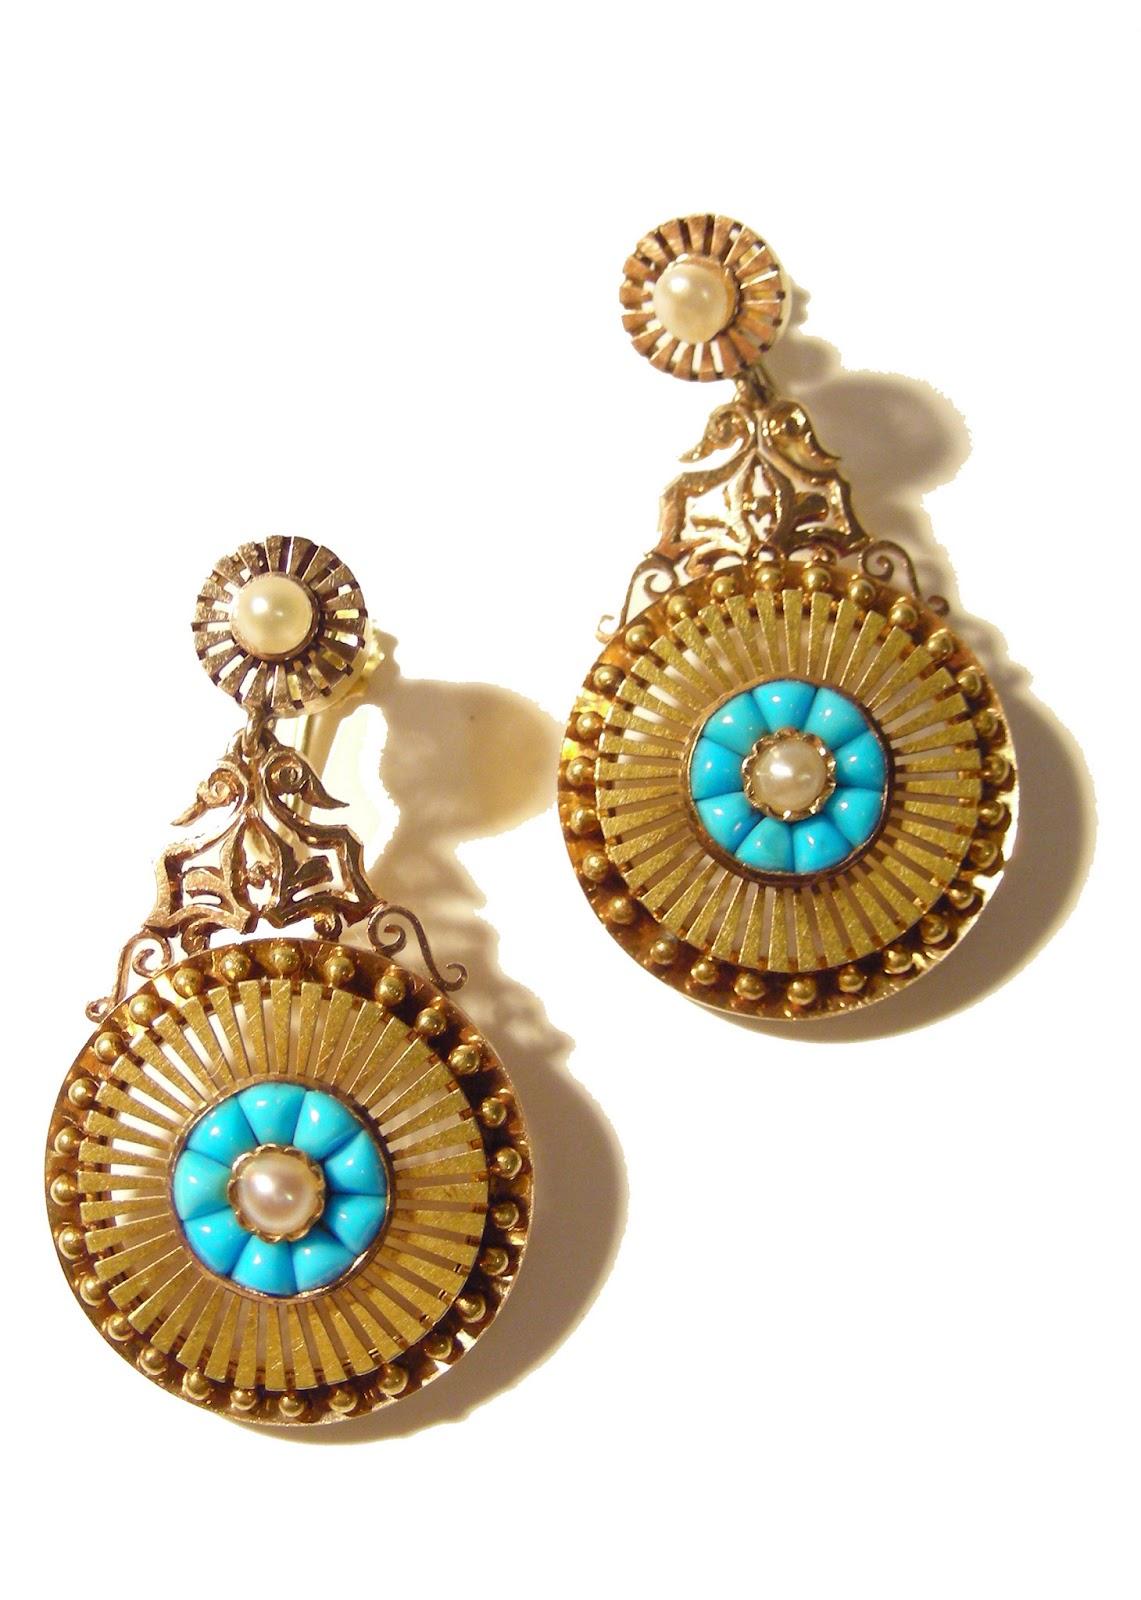 Latest Design Of Gold Earrings Latest Design Updates